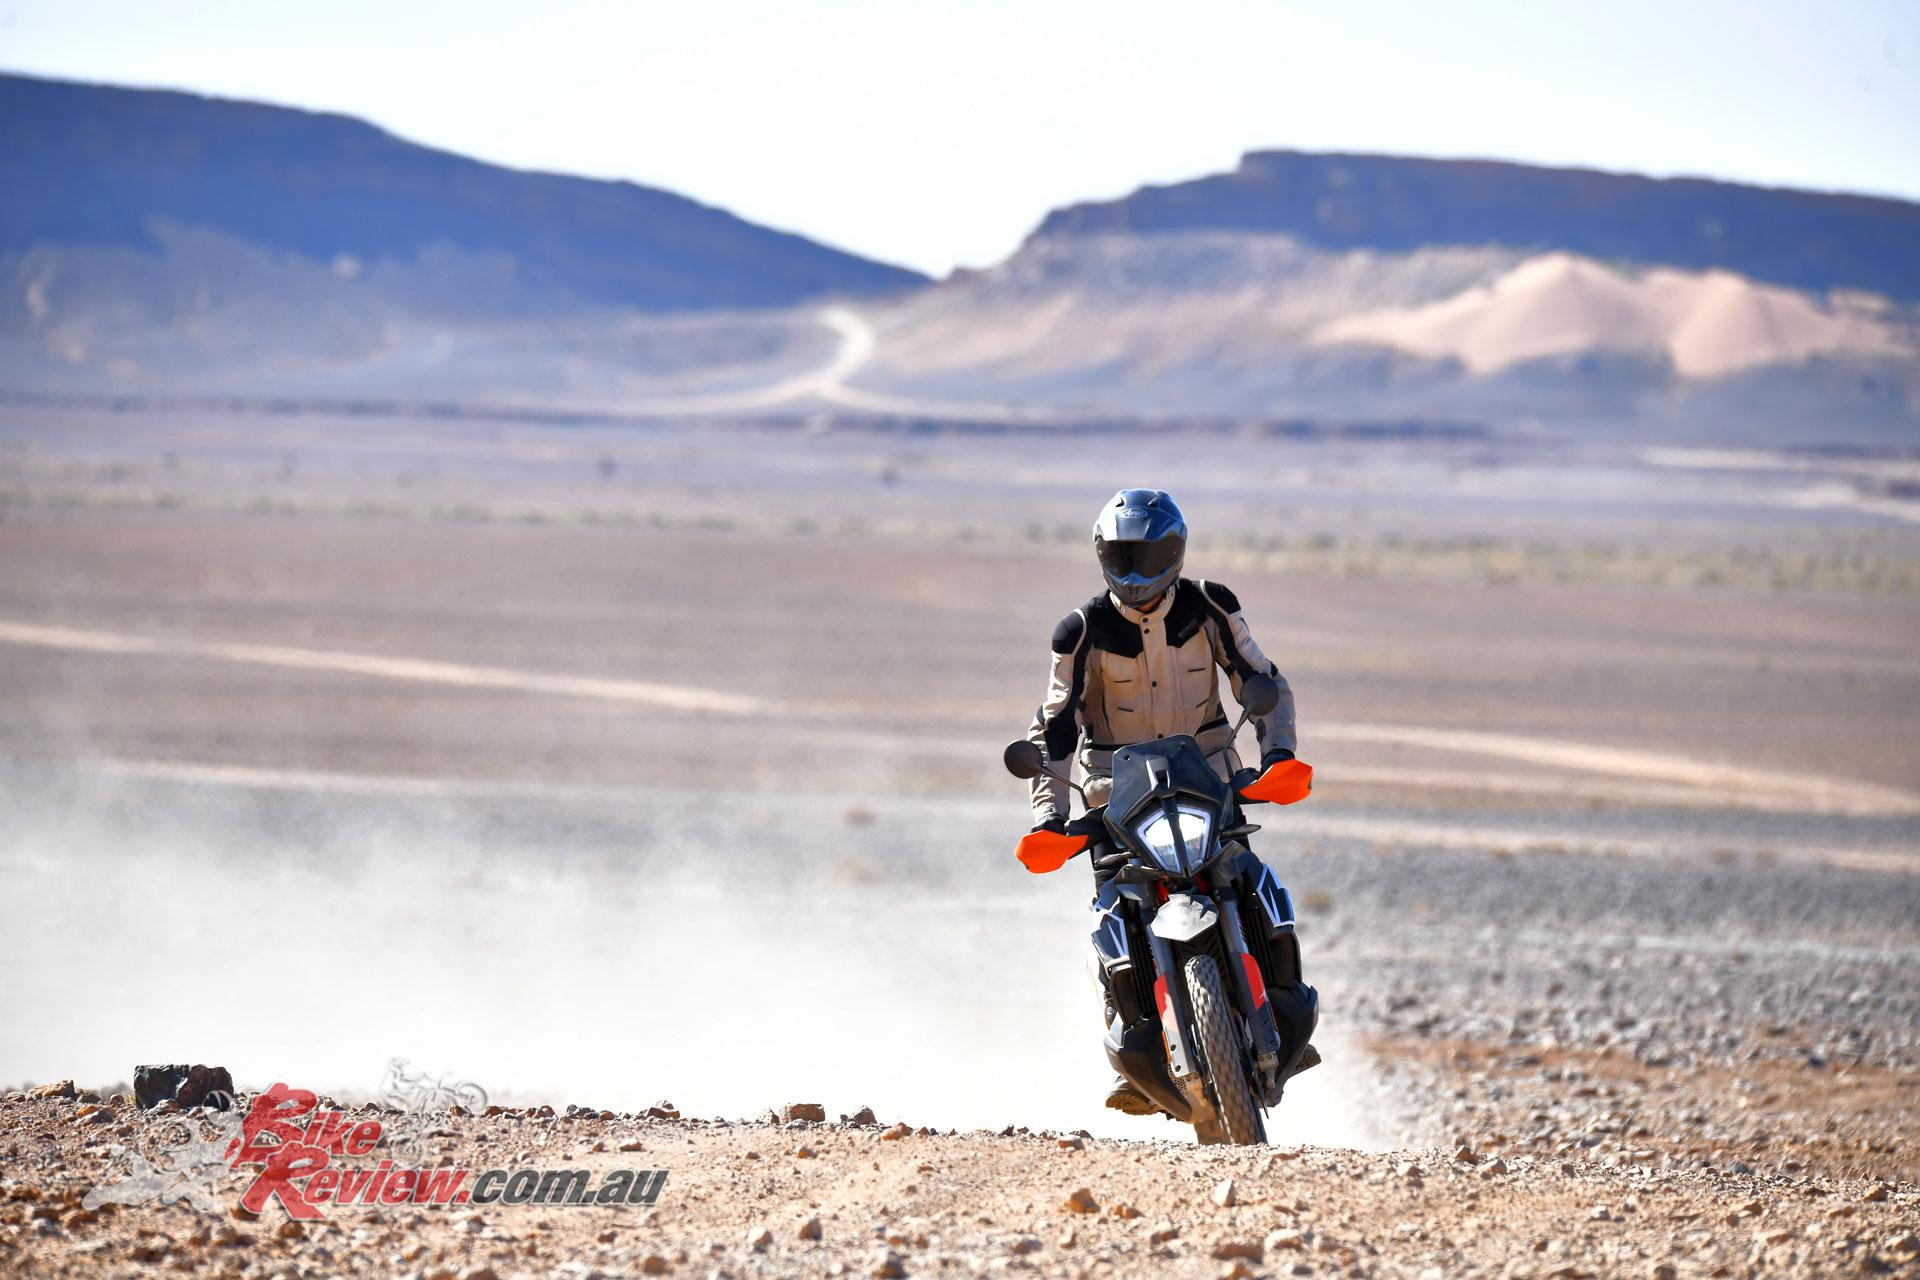 The 2019 KTM 790 Adventure R